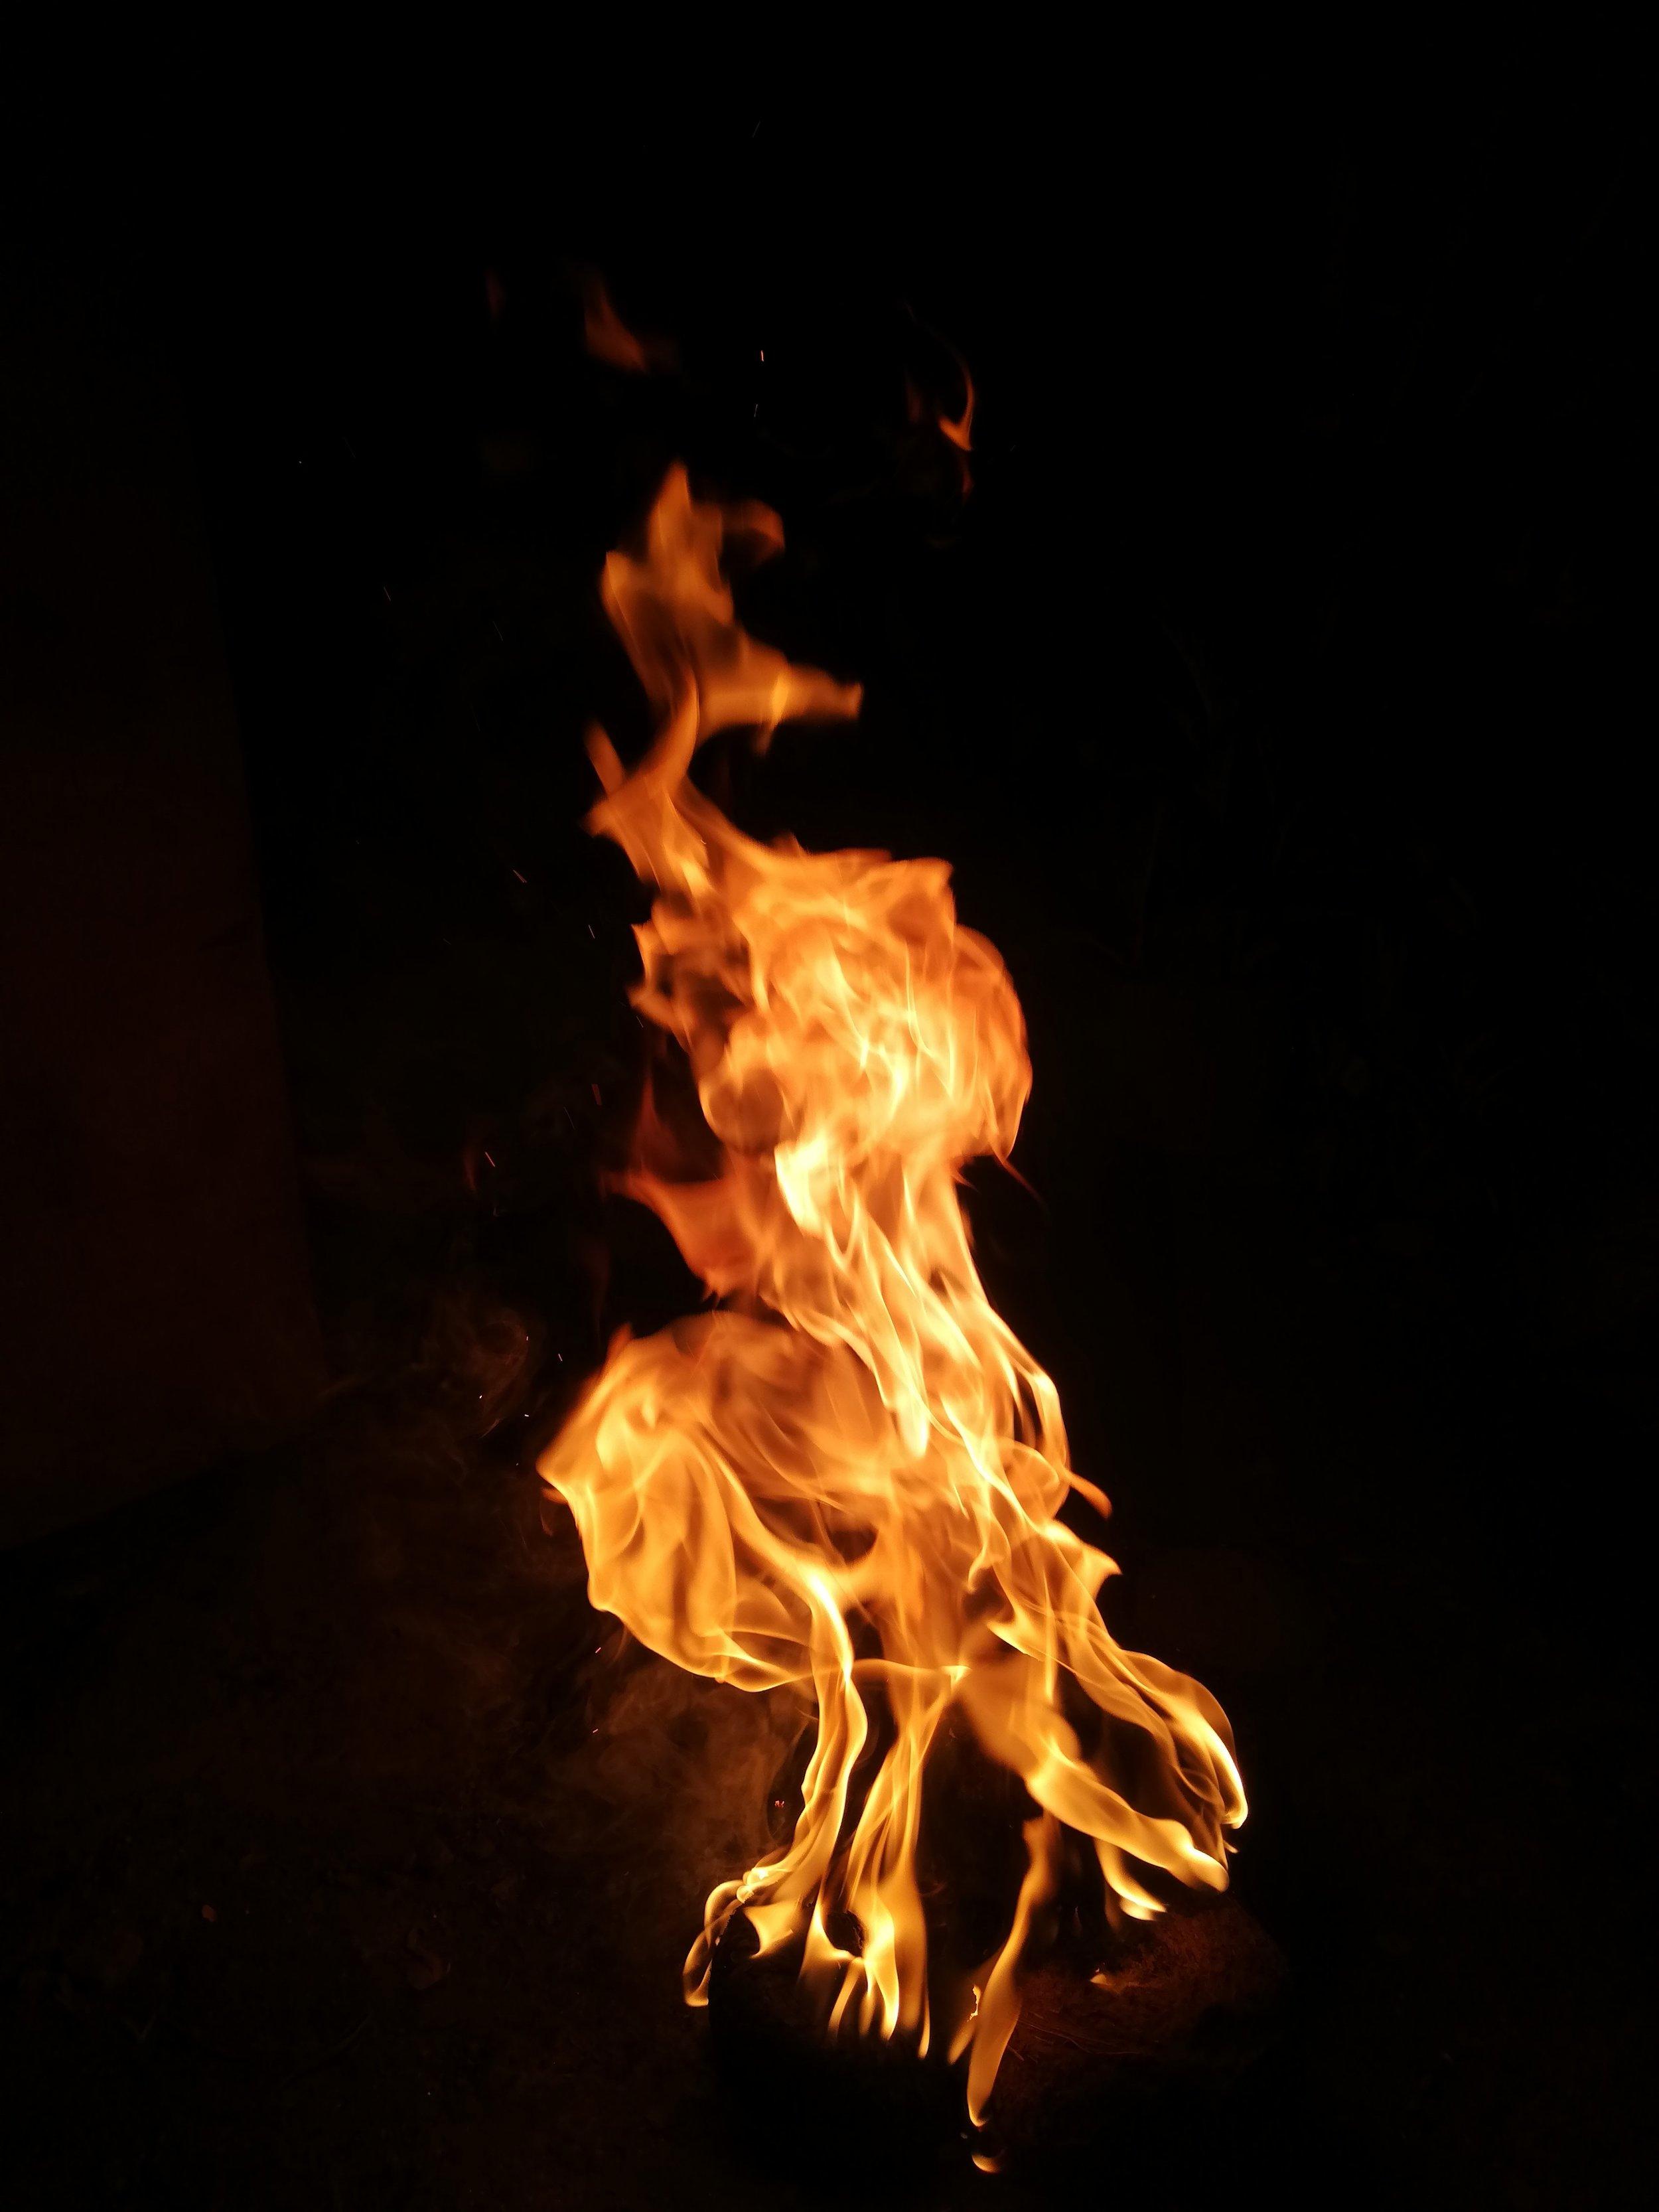 bonfire-campfire-flame-2233674.jpg